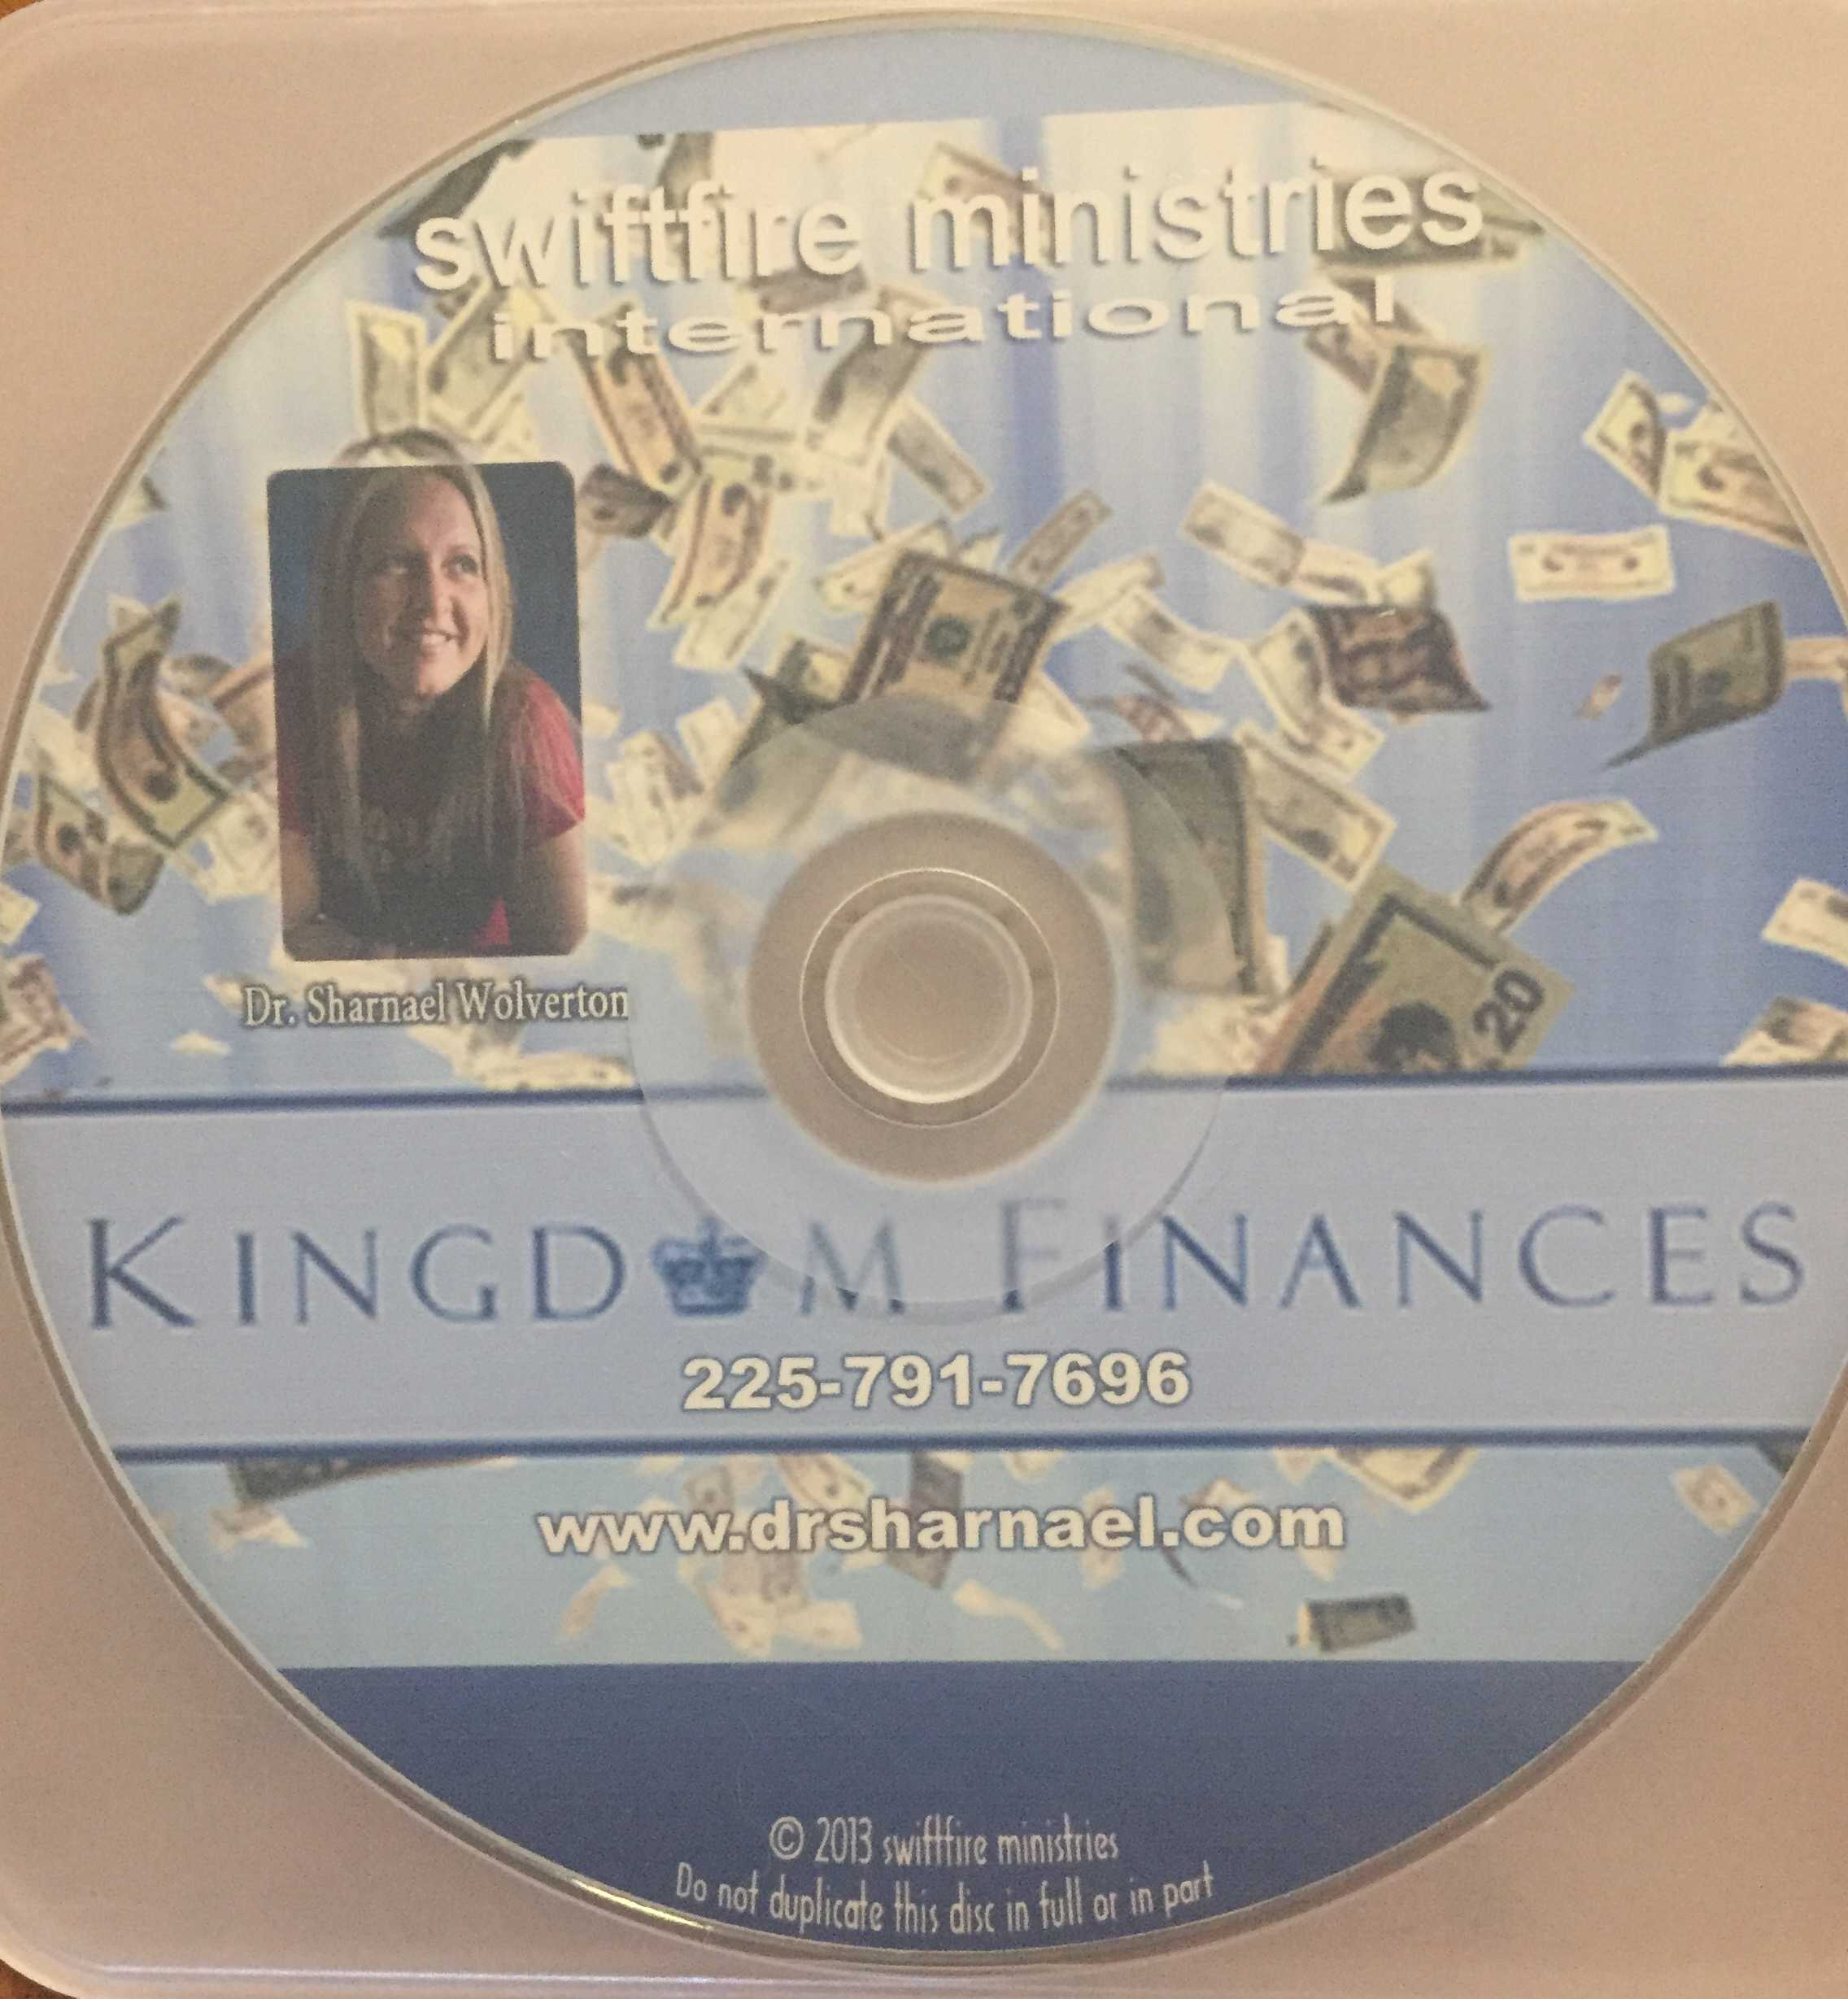 kingdomfinances